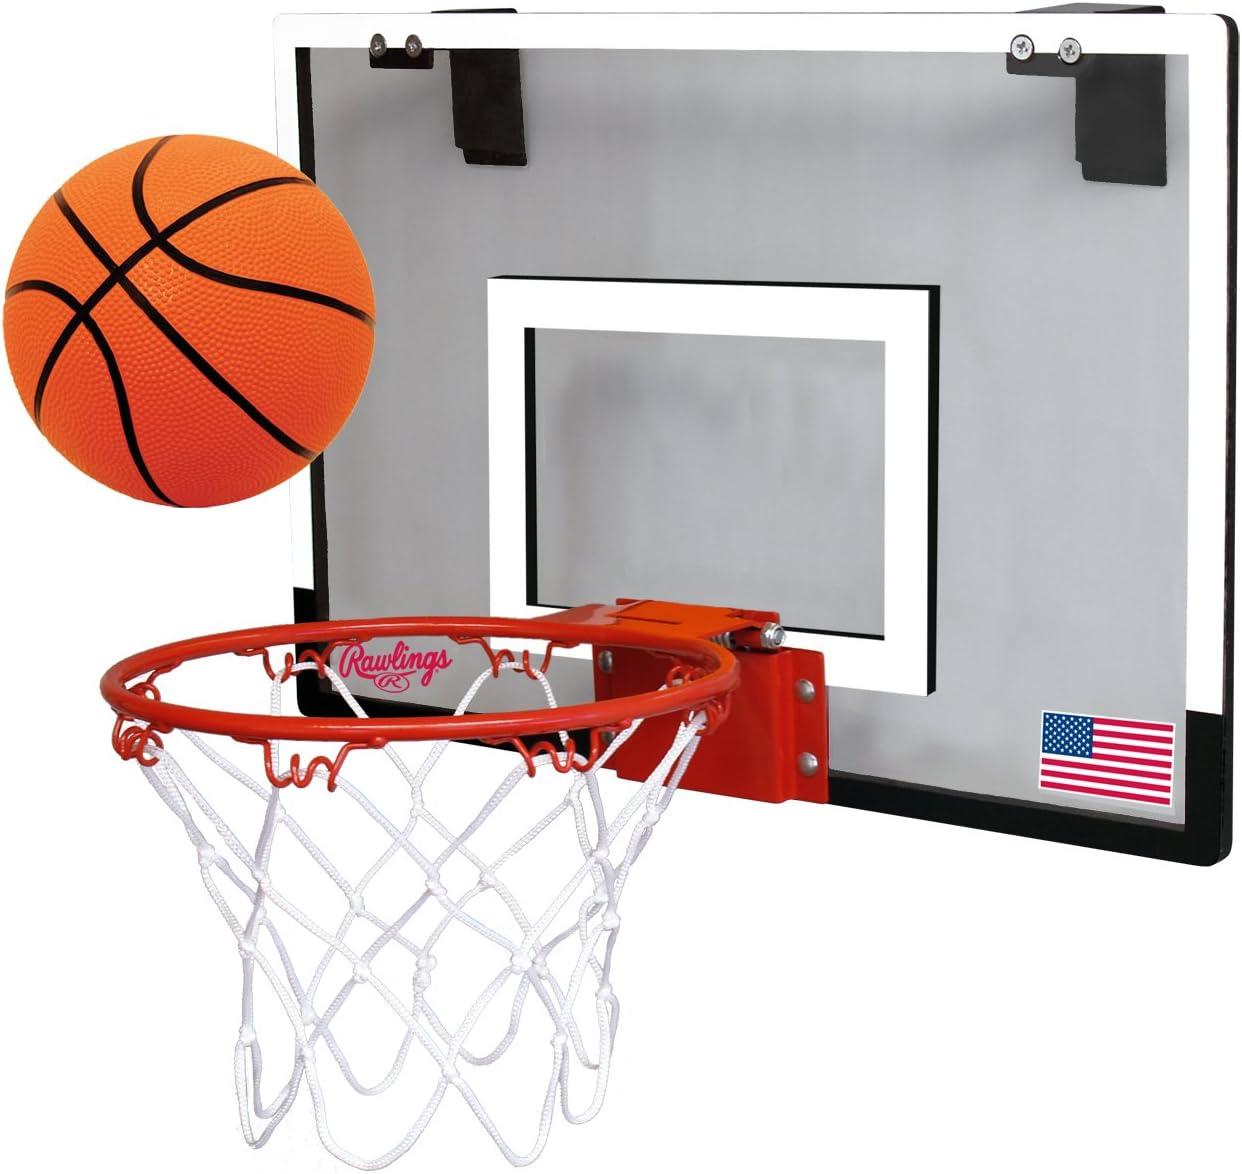 Rawlings Sporting Goods Game On Basketball Backboard Hoop Set, White, 18 x 12